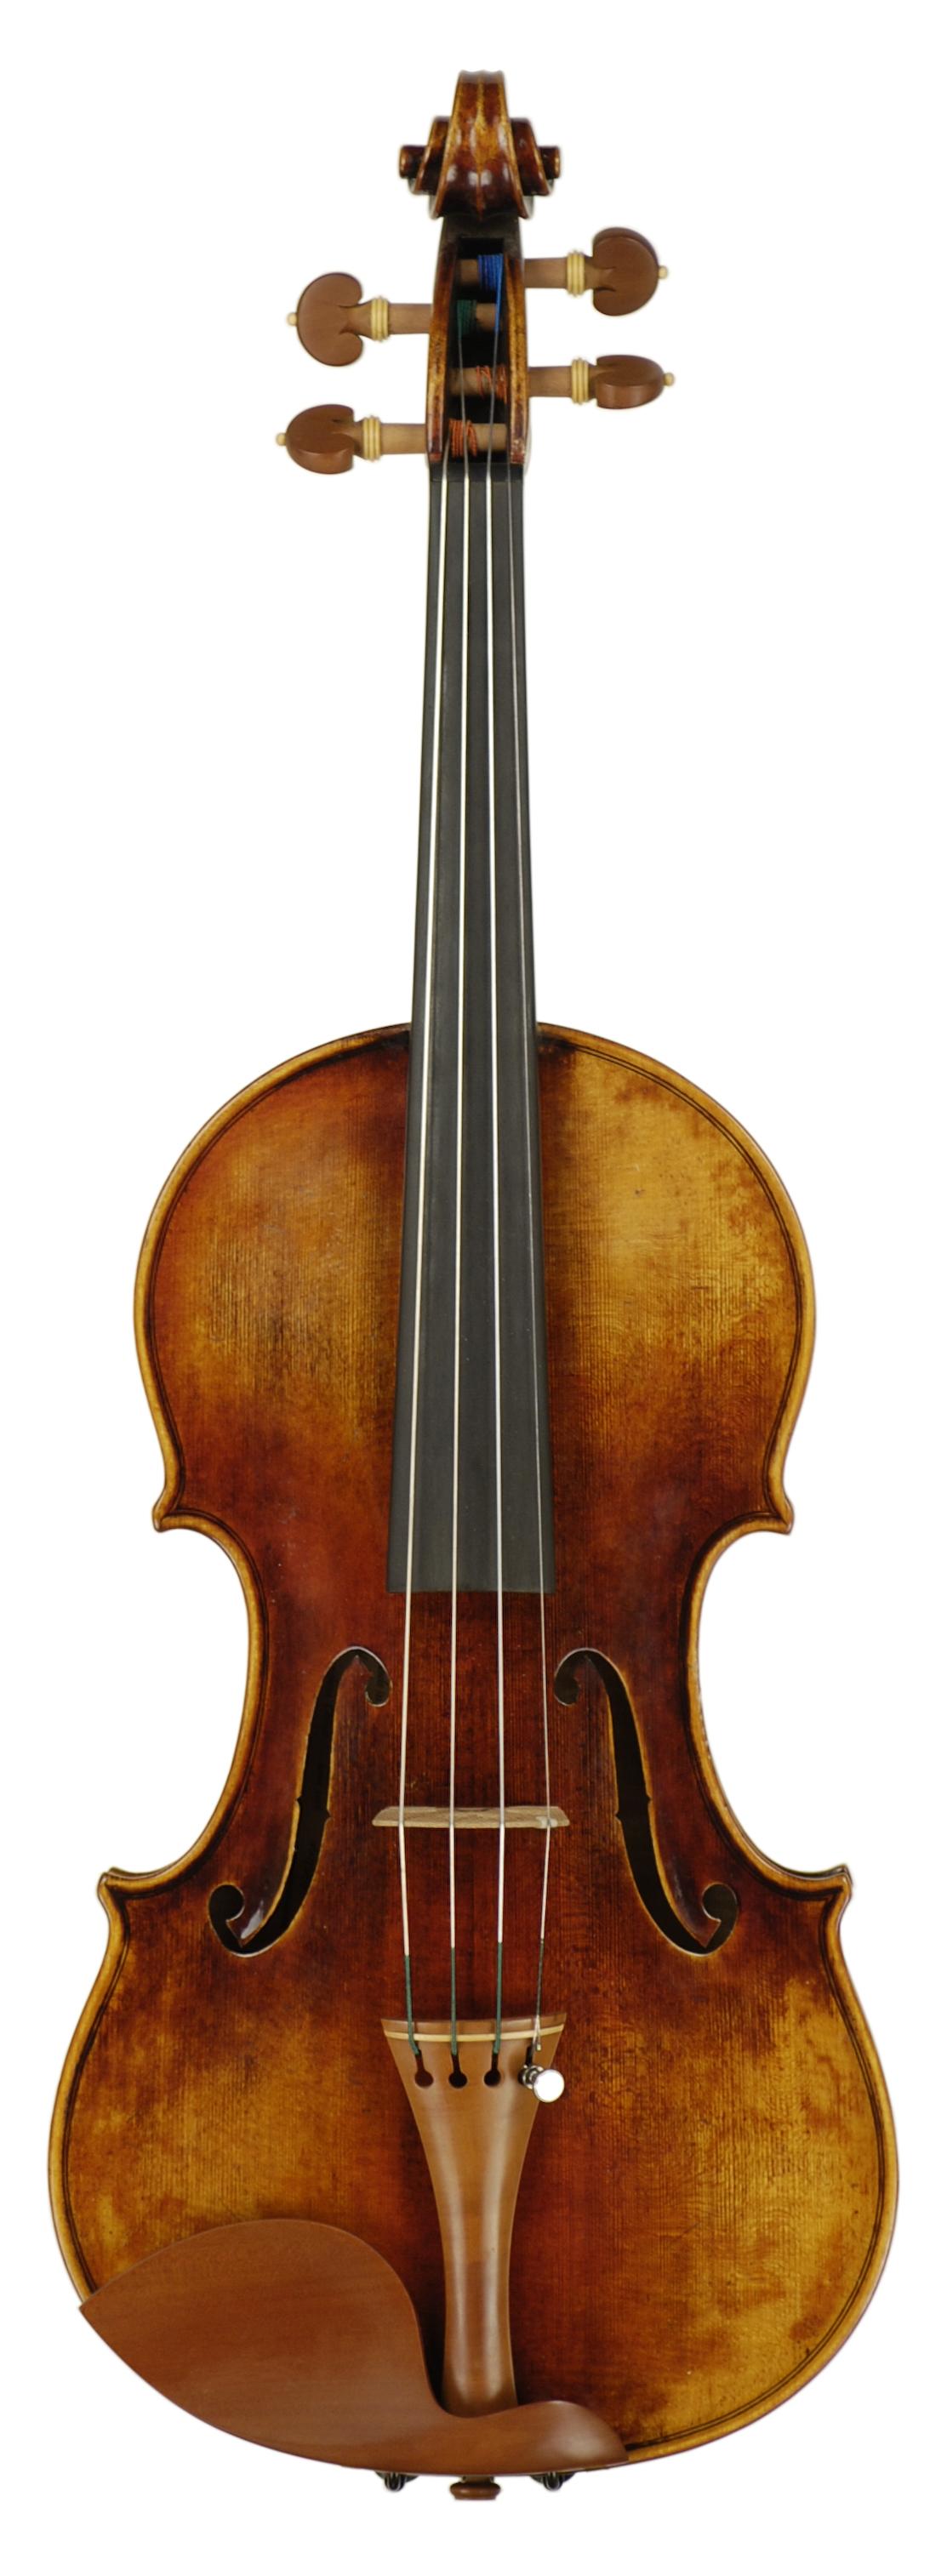 Tonobello j r judd violins Vibeline